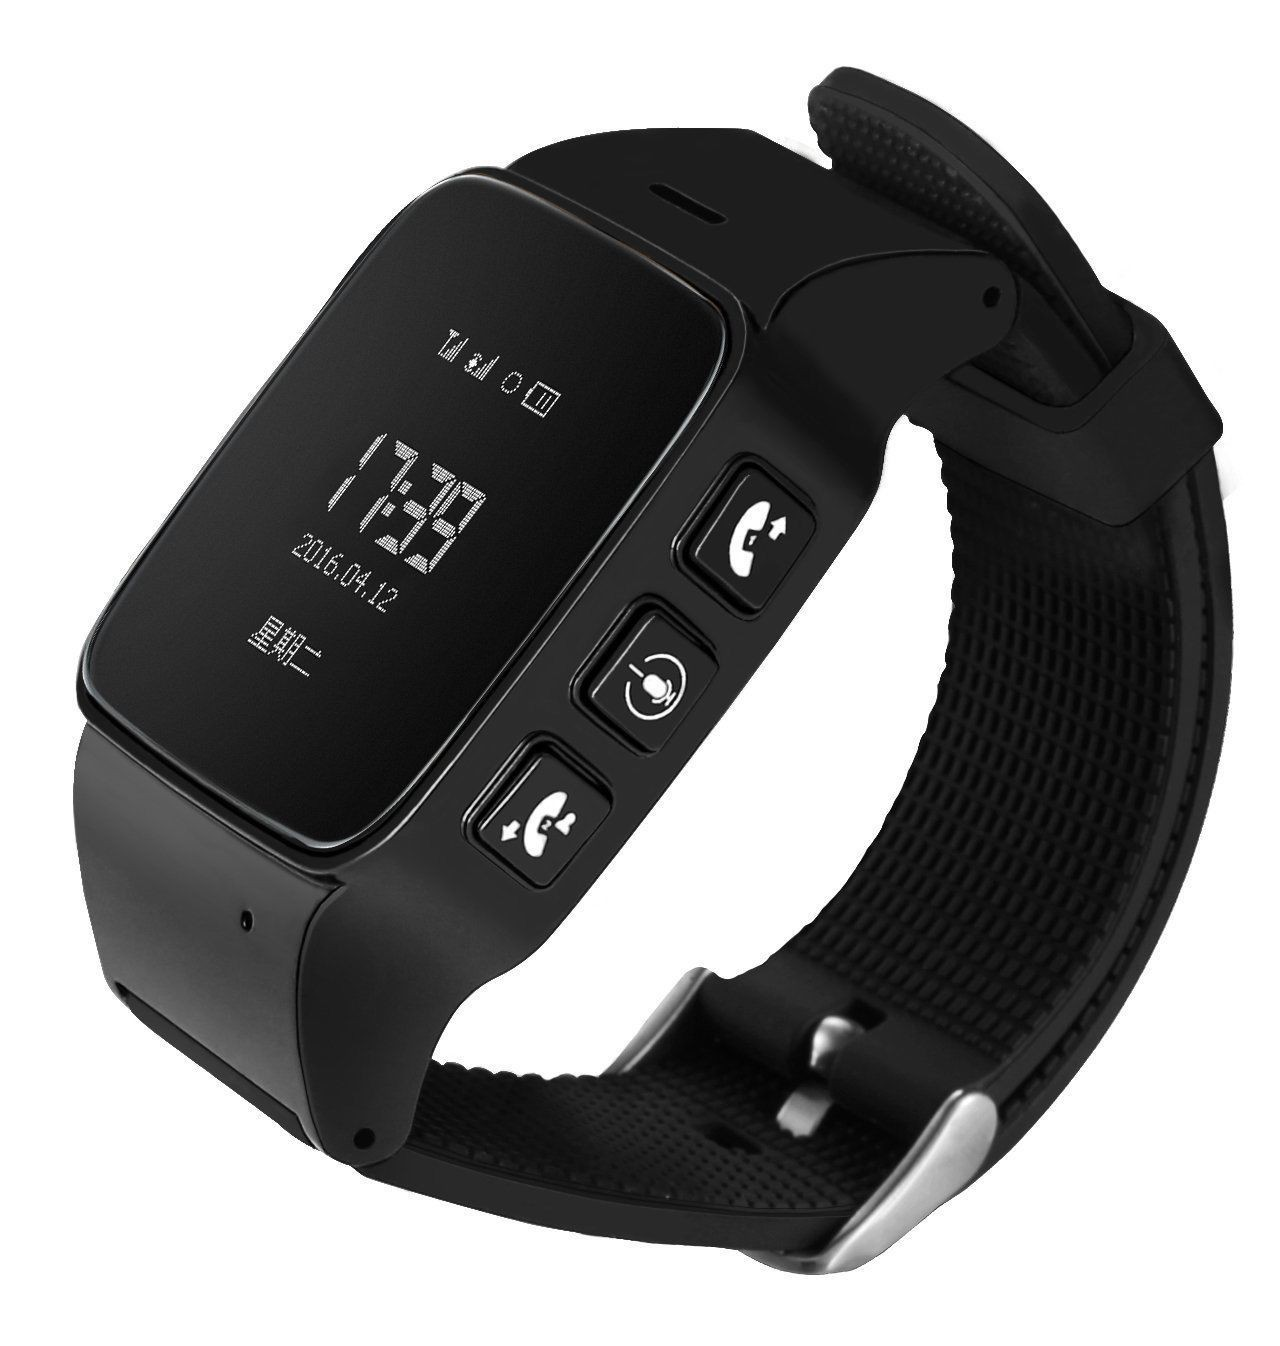 Ceas GPS Copii si Seniori iUni U100, Telefon incorporat, Pedometru, Notificari, Wi-fi, Black imagine techstar.ro 2021